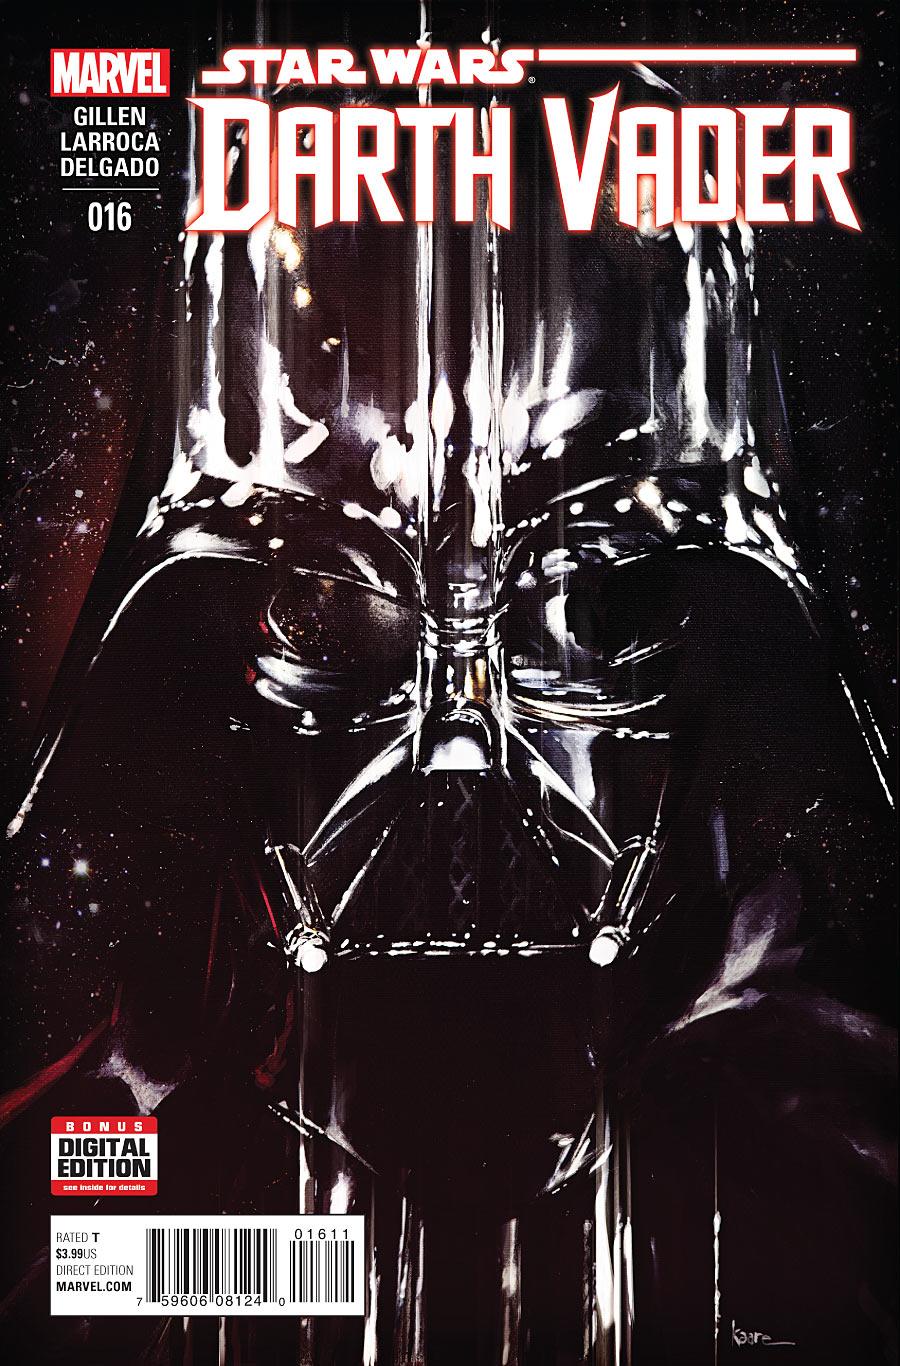 Dark Vador 16 - Book III - Part I - The Shu-Torun War